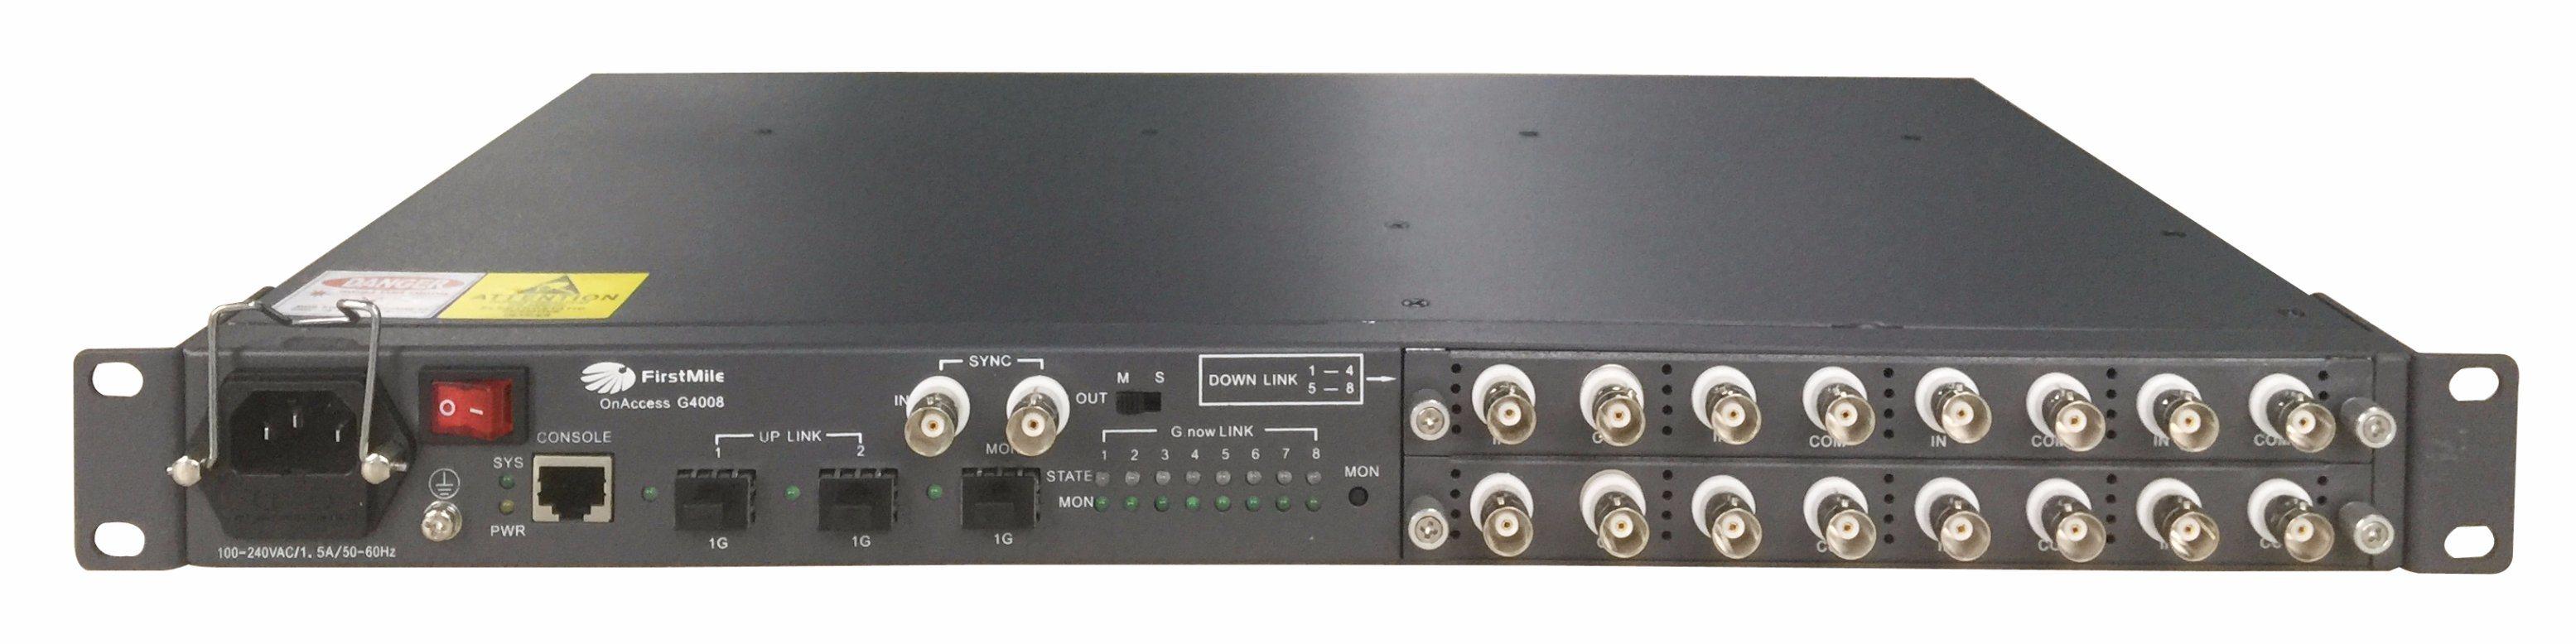 IP Camera Transmitter Eoc Ethernet Over Coax Converter